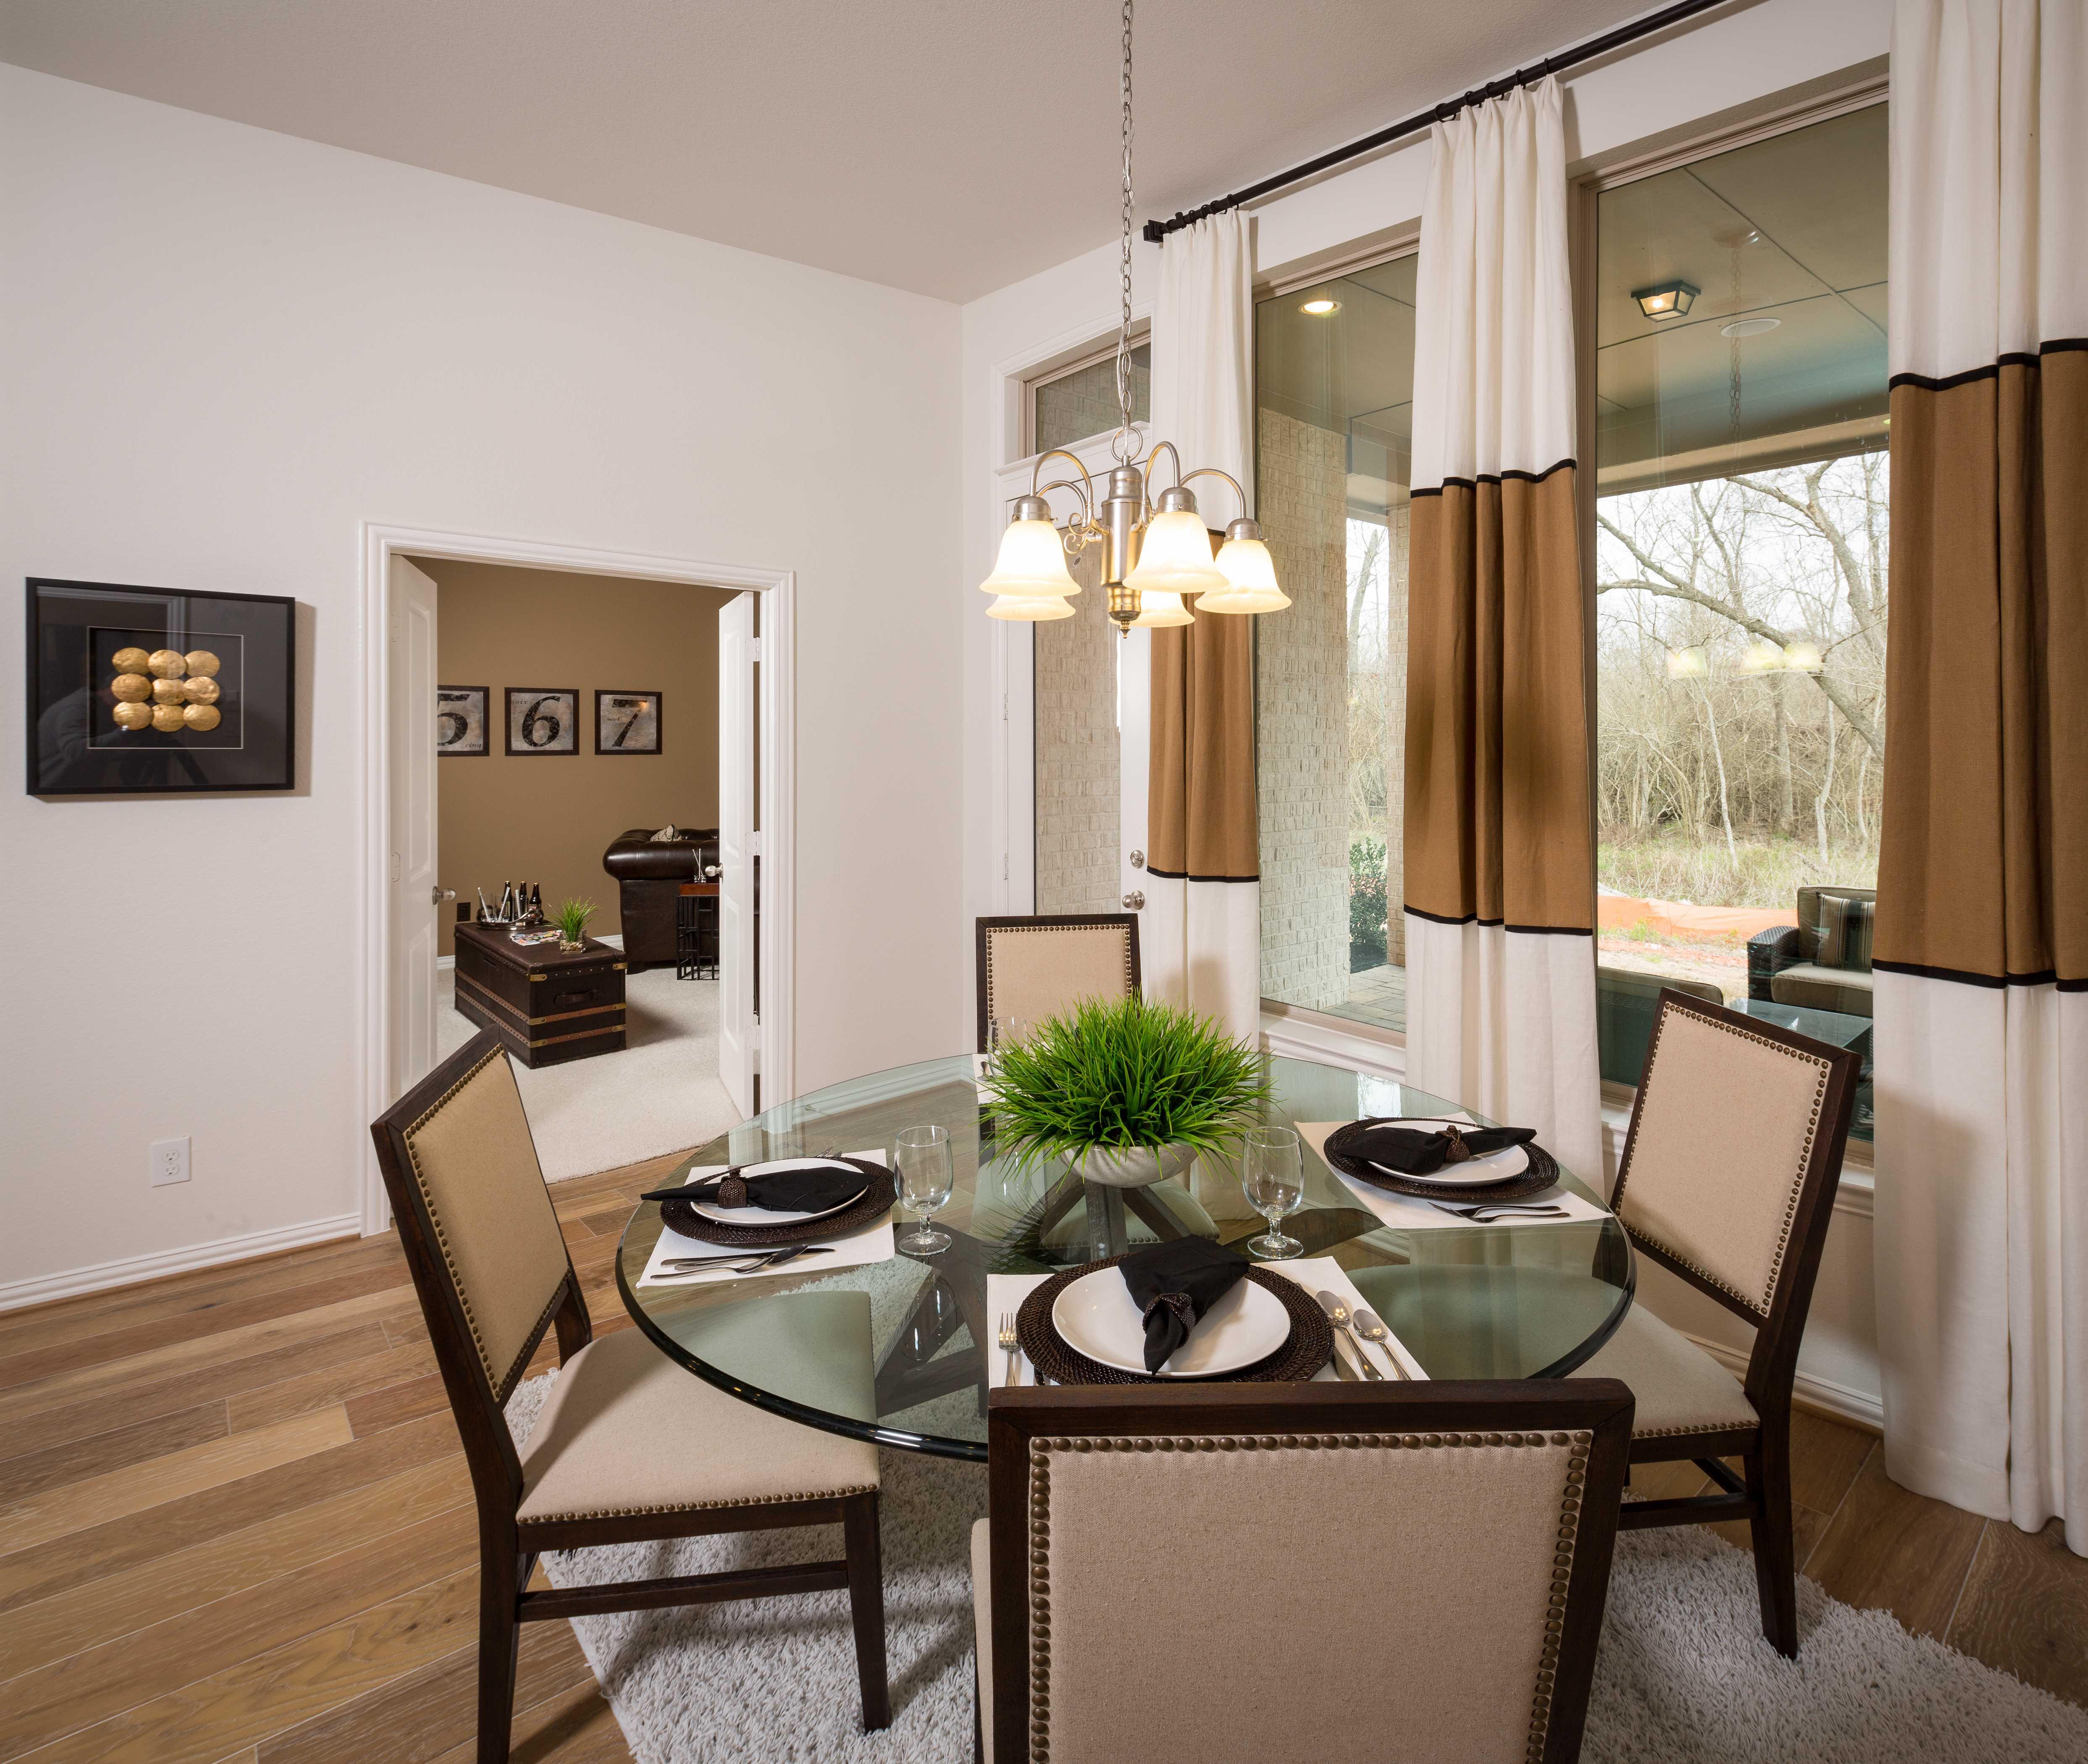 Model Home In Houston Texas, Fulbrook On Fulshear Creek